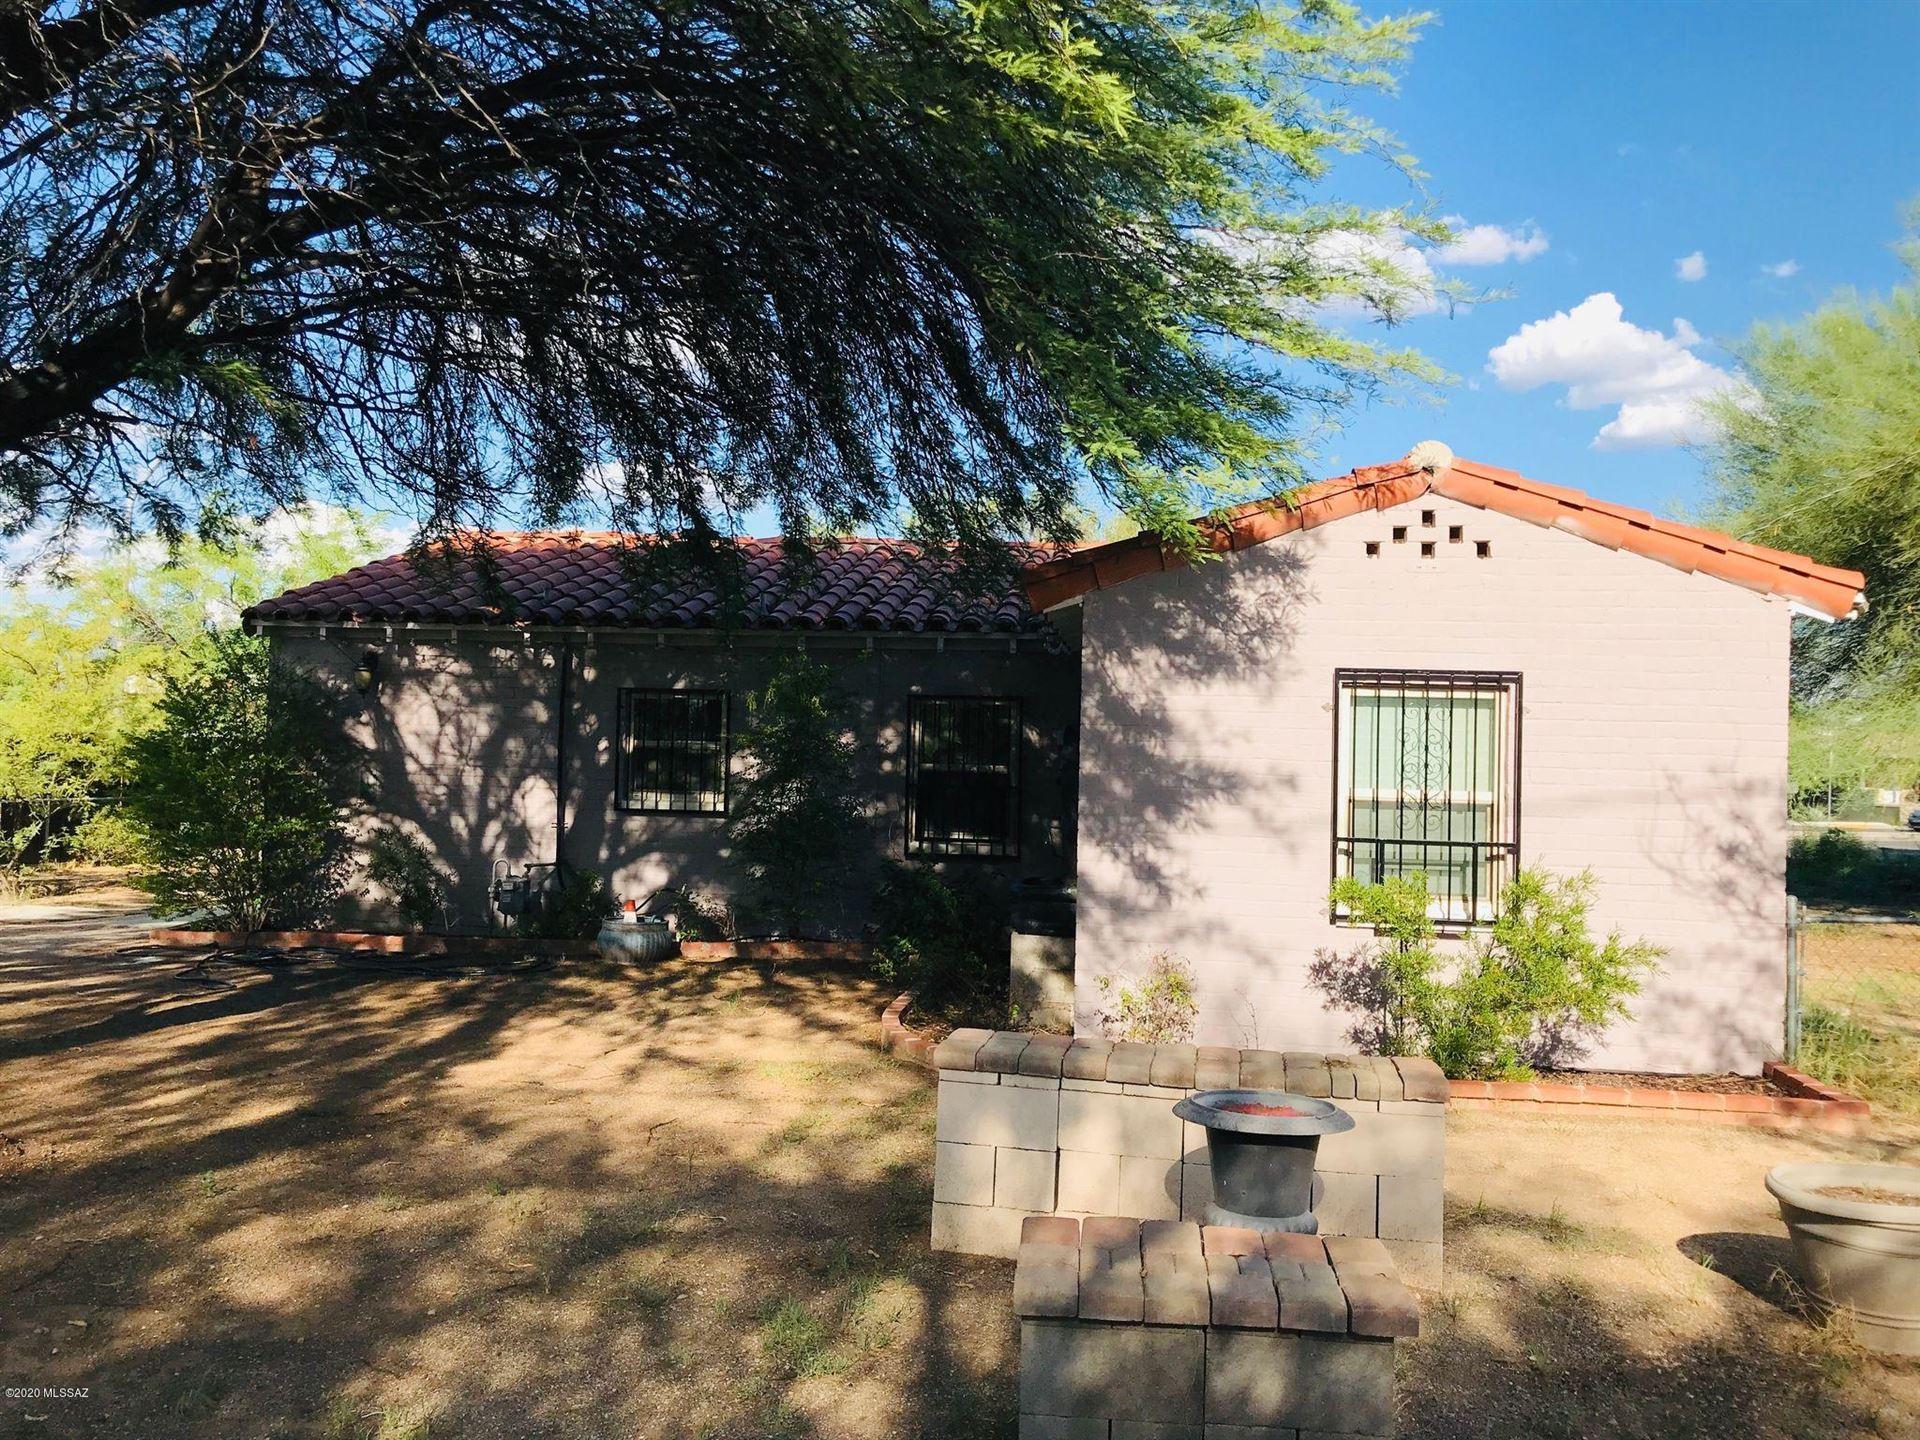 2333 N 1St Avenue, Tucson, AZ 85719 - MLS#: 22025798